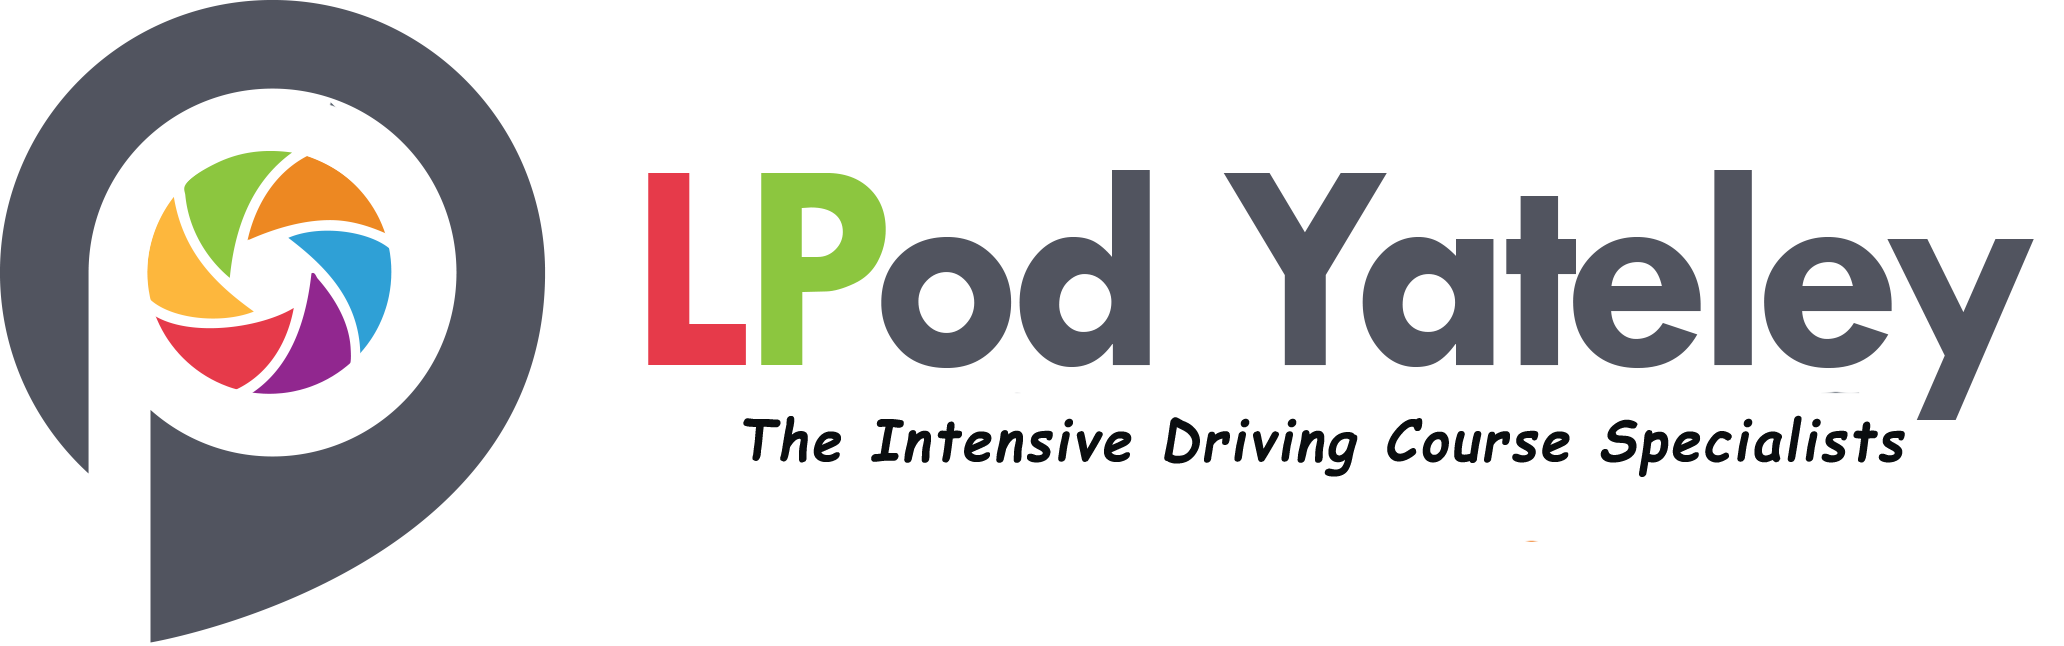 intensive driving courses Yateley, one week driving courses yateley, crash driving courses yateley, LPOD Academy yateley